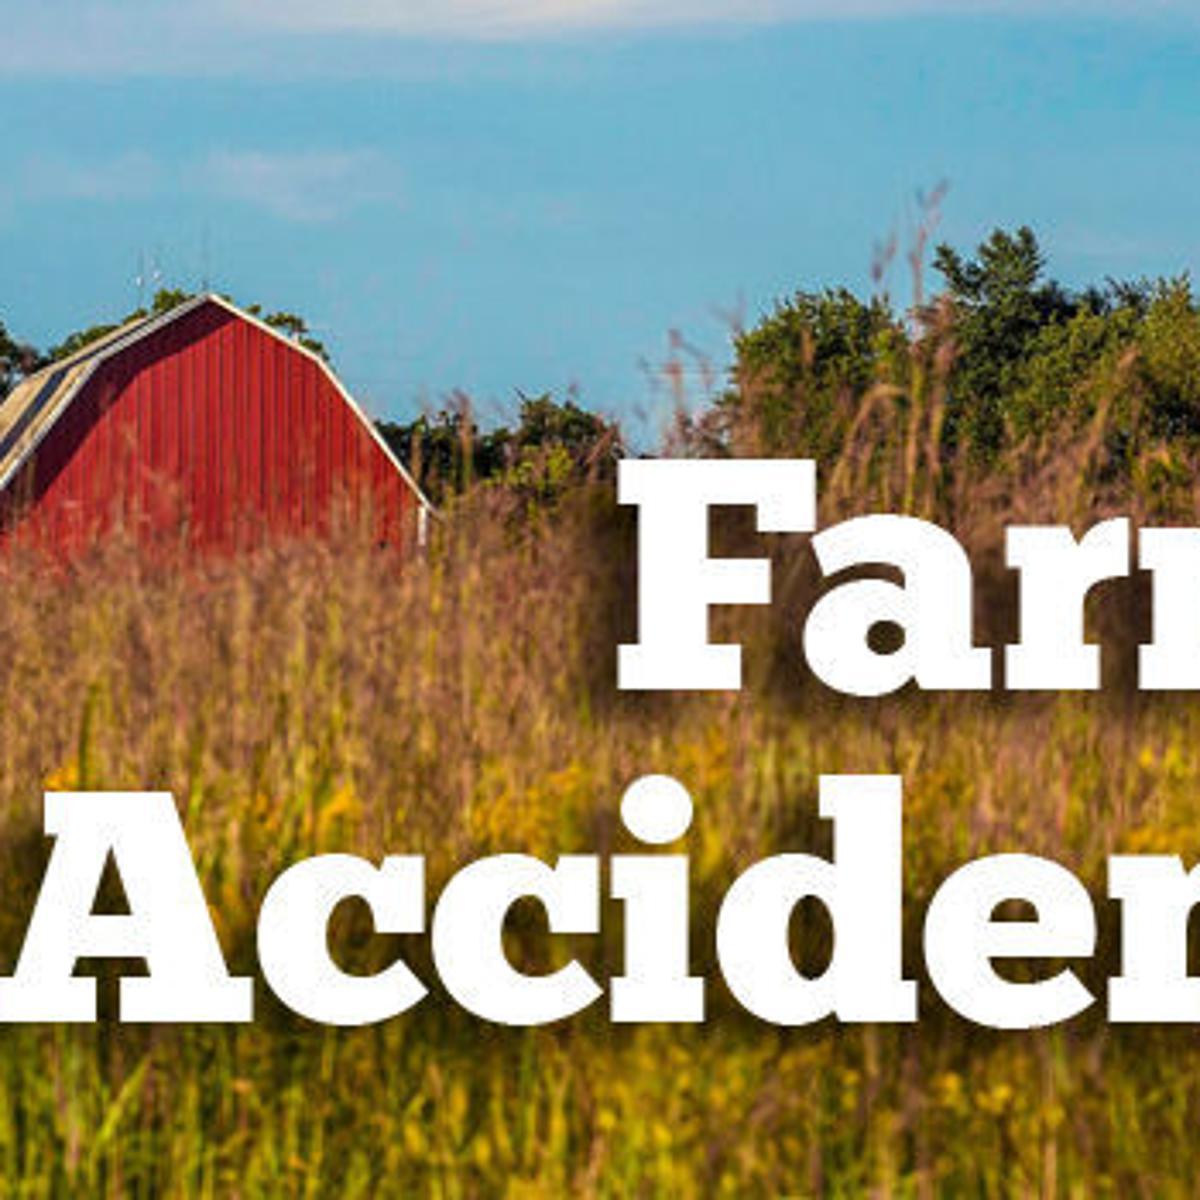 Man dies in Sutherland farm accident   Siouxland Crime